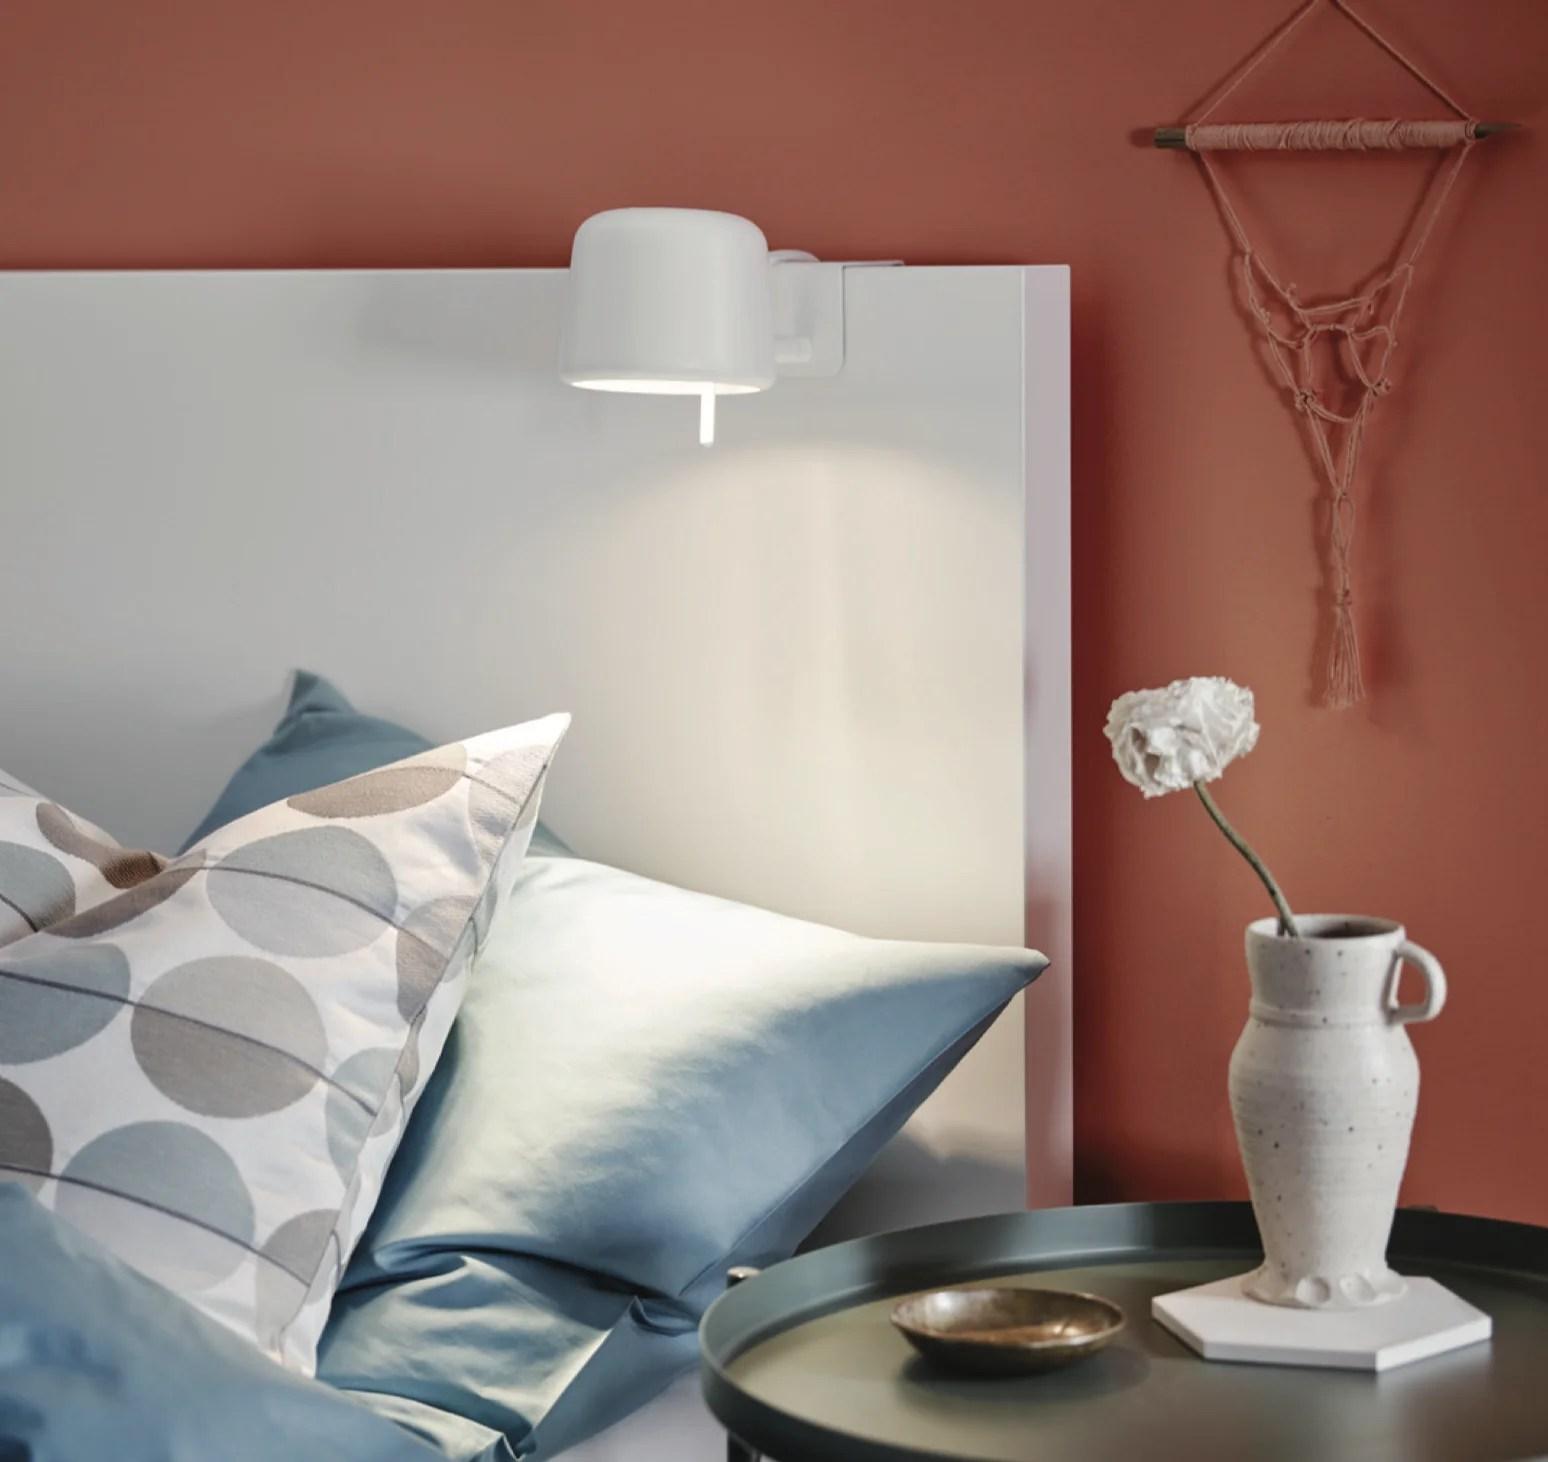 Varv La Mini Lampe Ikea Saccroche à La Tête De Lit La